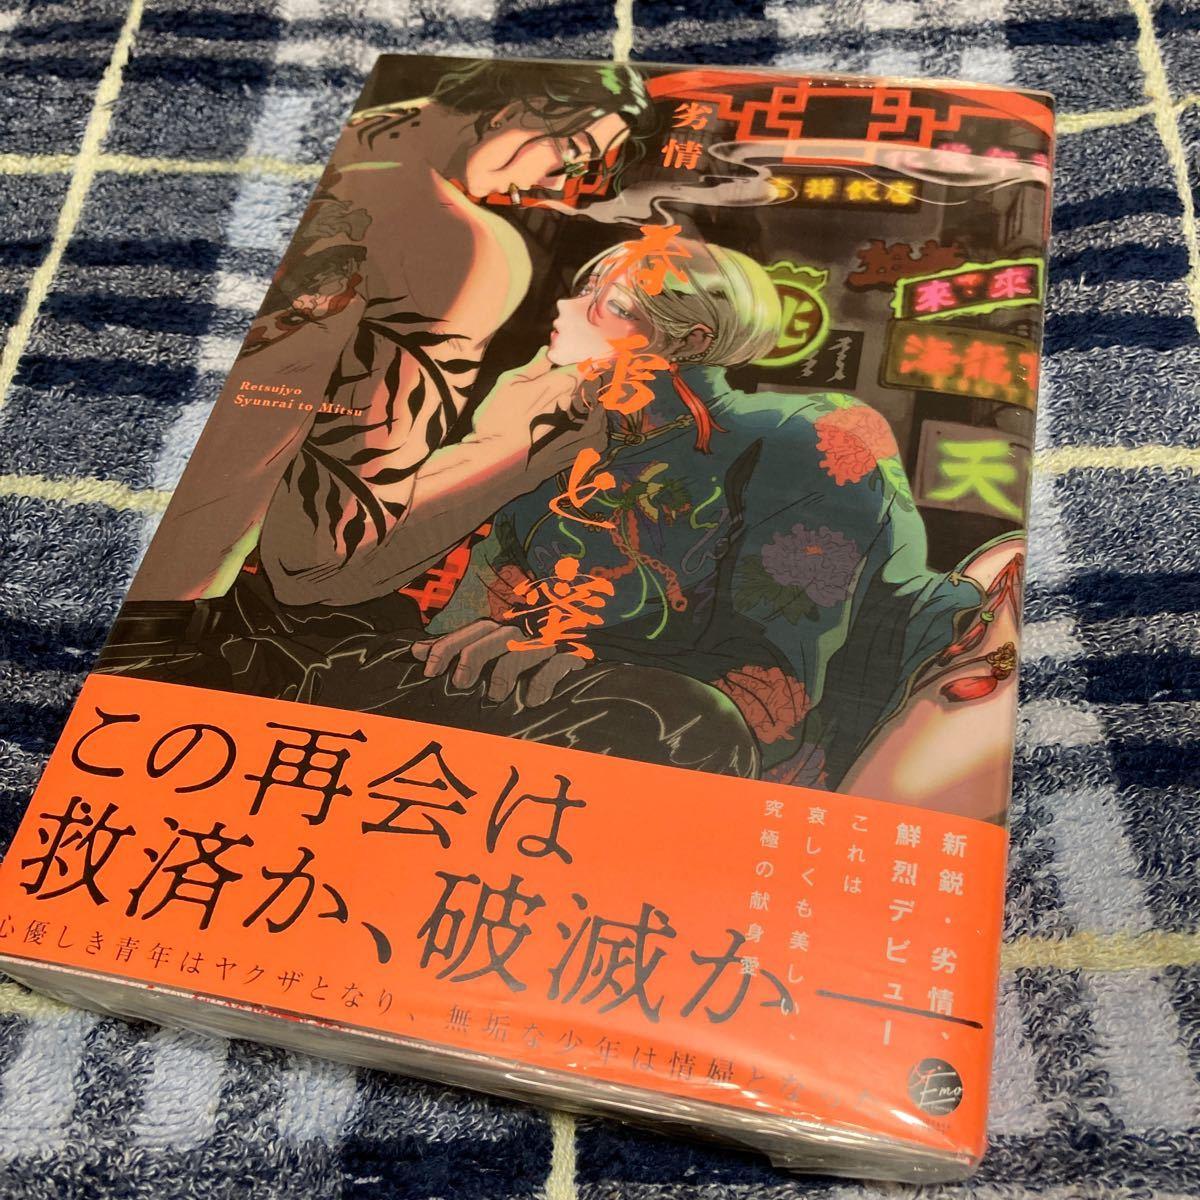 BL 漫画 コミック 春雷と蜜 劣情